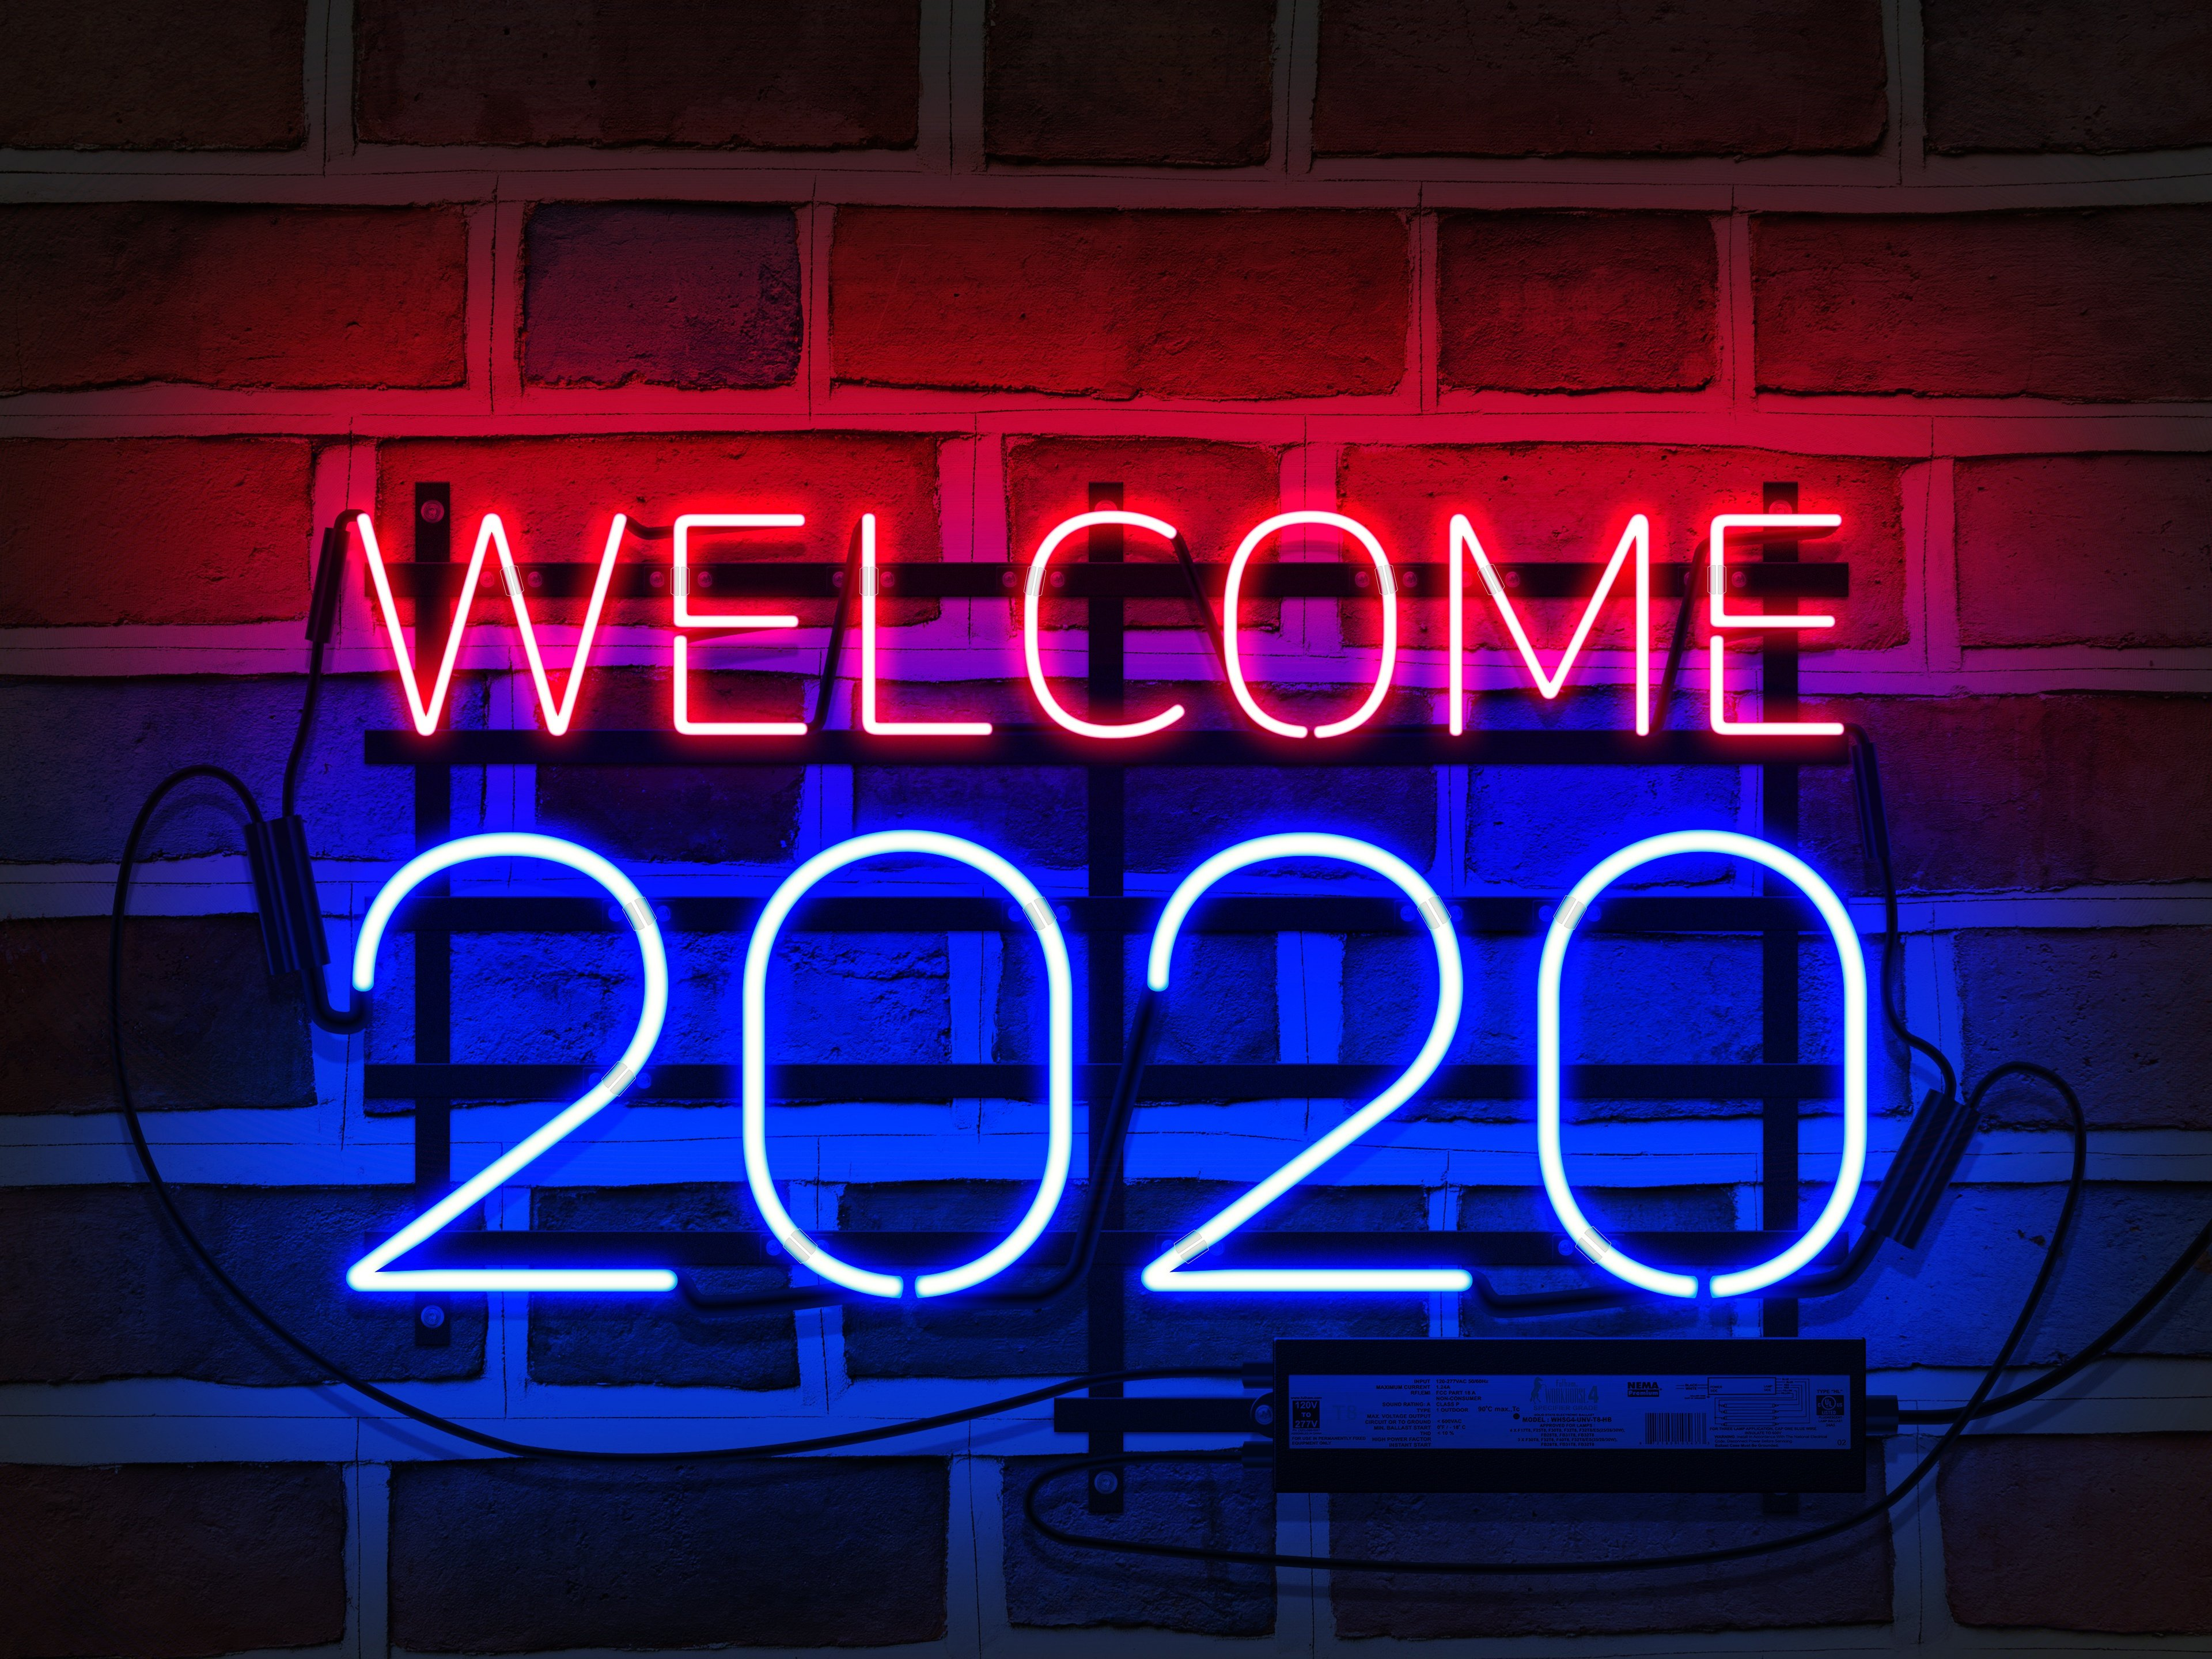 New Year 2020 4k Ultra HD Wallpaper Background Image 3840x2880 3840x2880